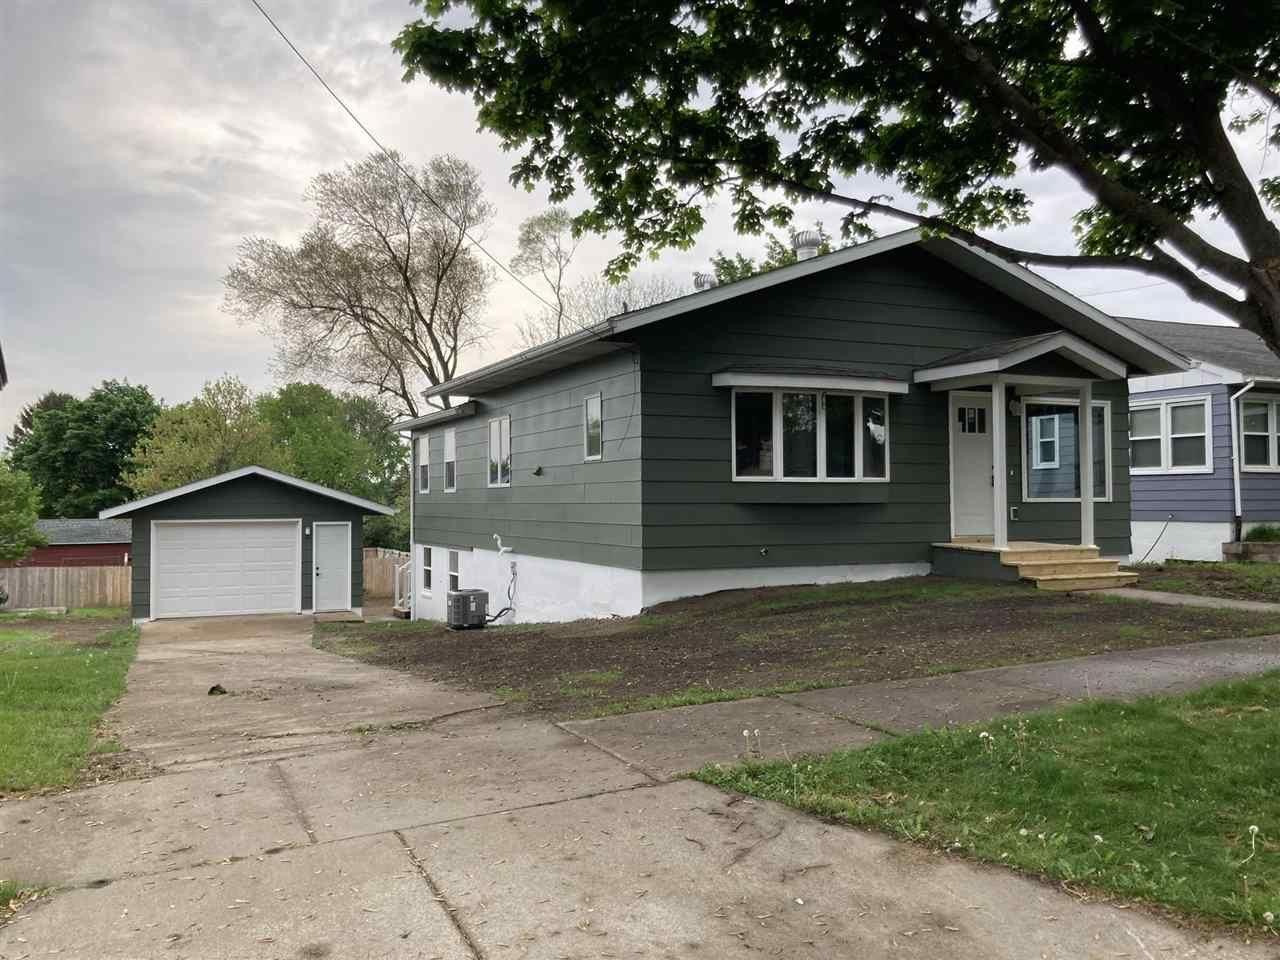 610 Glendale Ave, Tomah, WI 54660 - #: 1909121